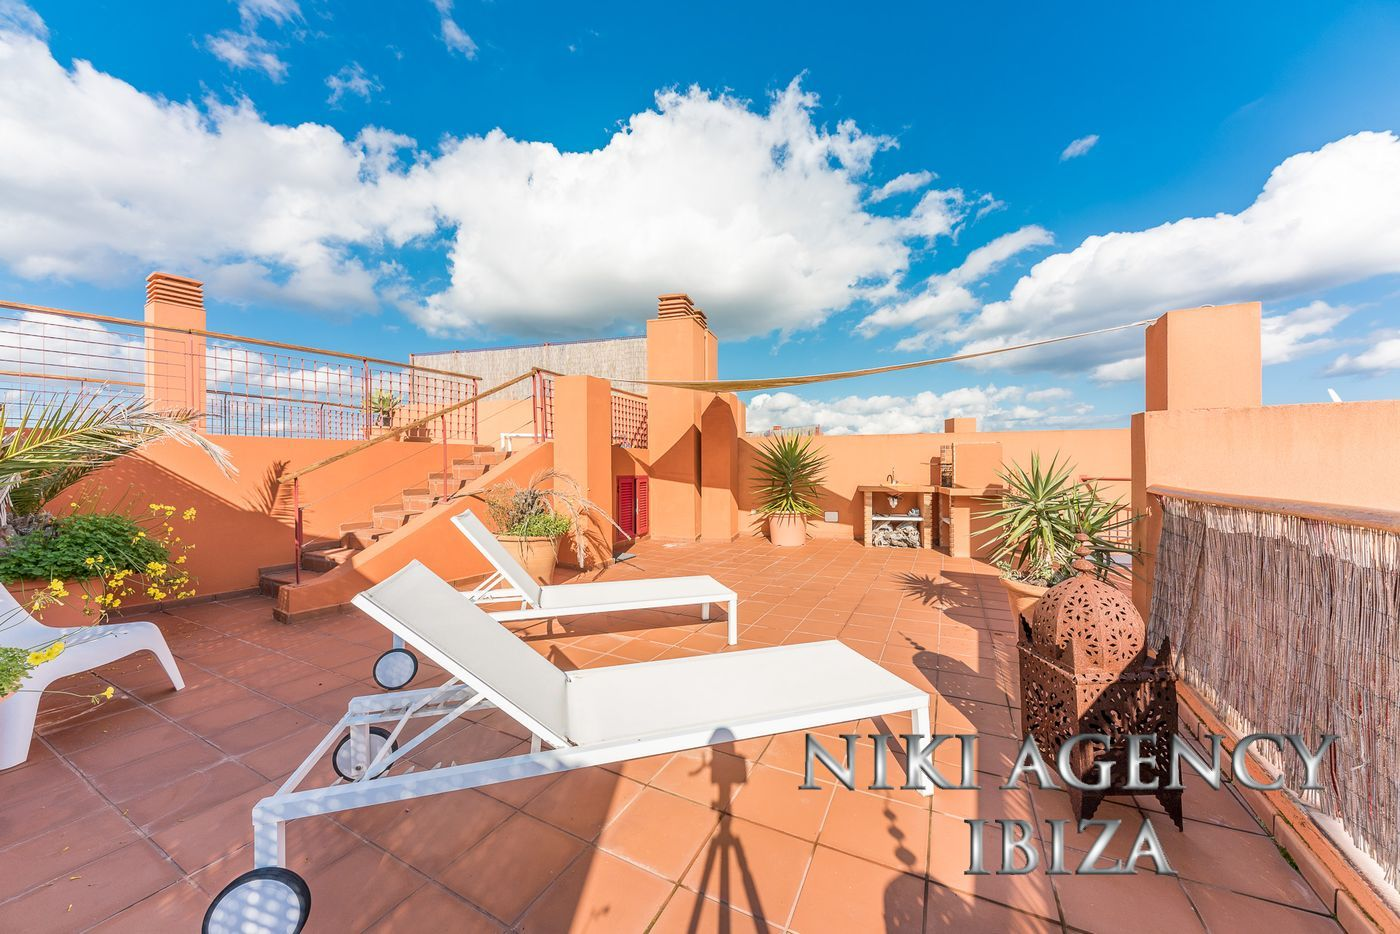 Attic in roca llisa with private pool niki agency ibiza your real estate agency in ibiza - Roca llisa ibiza ...